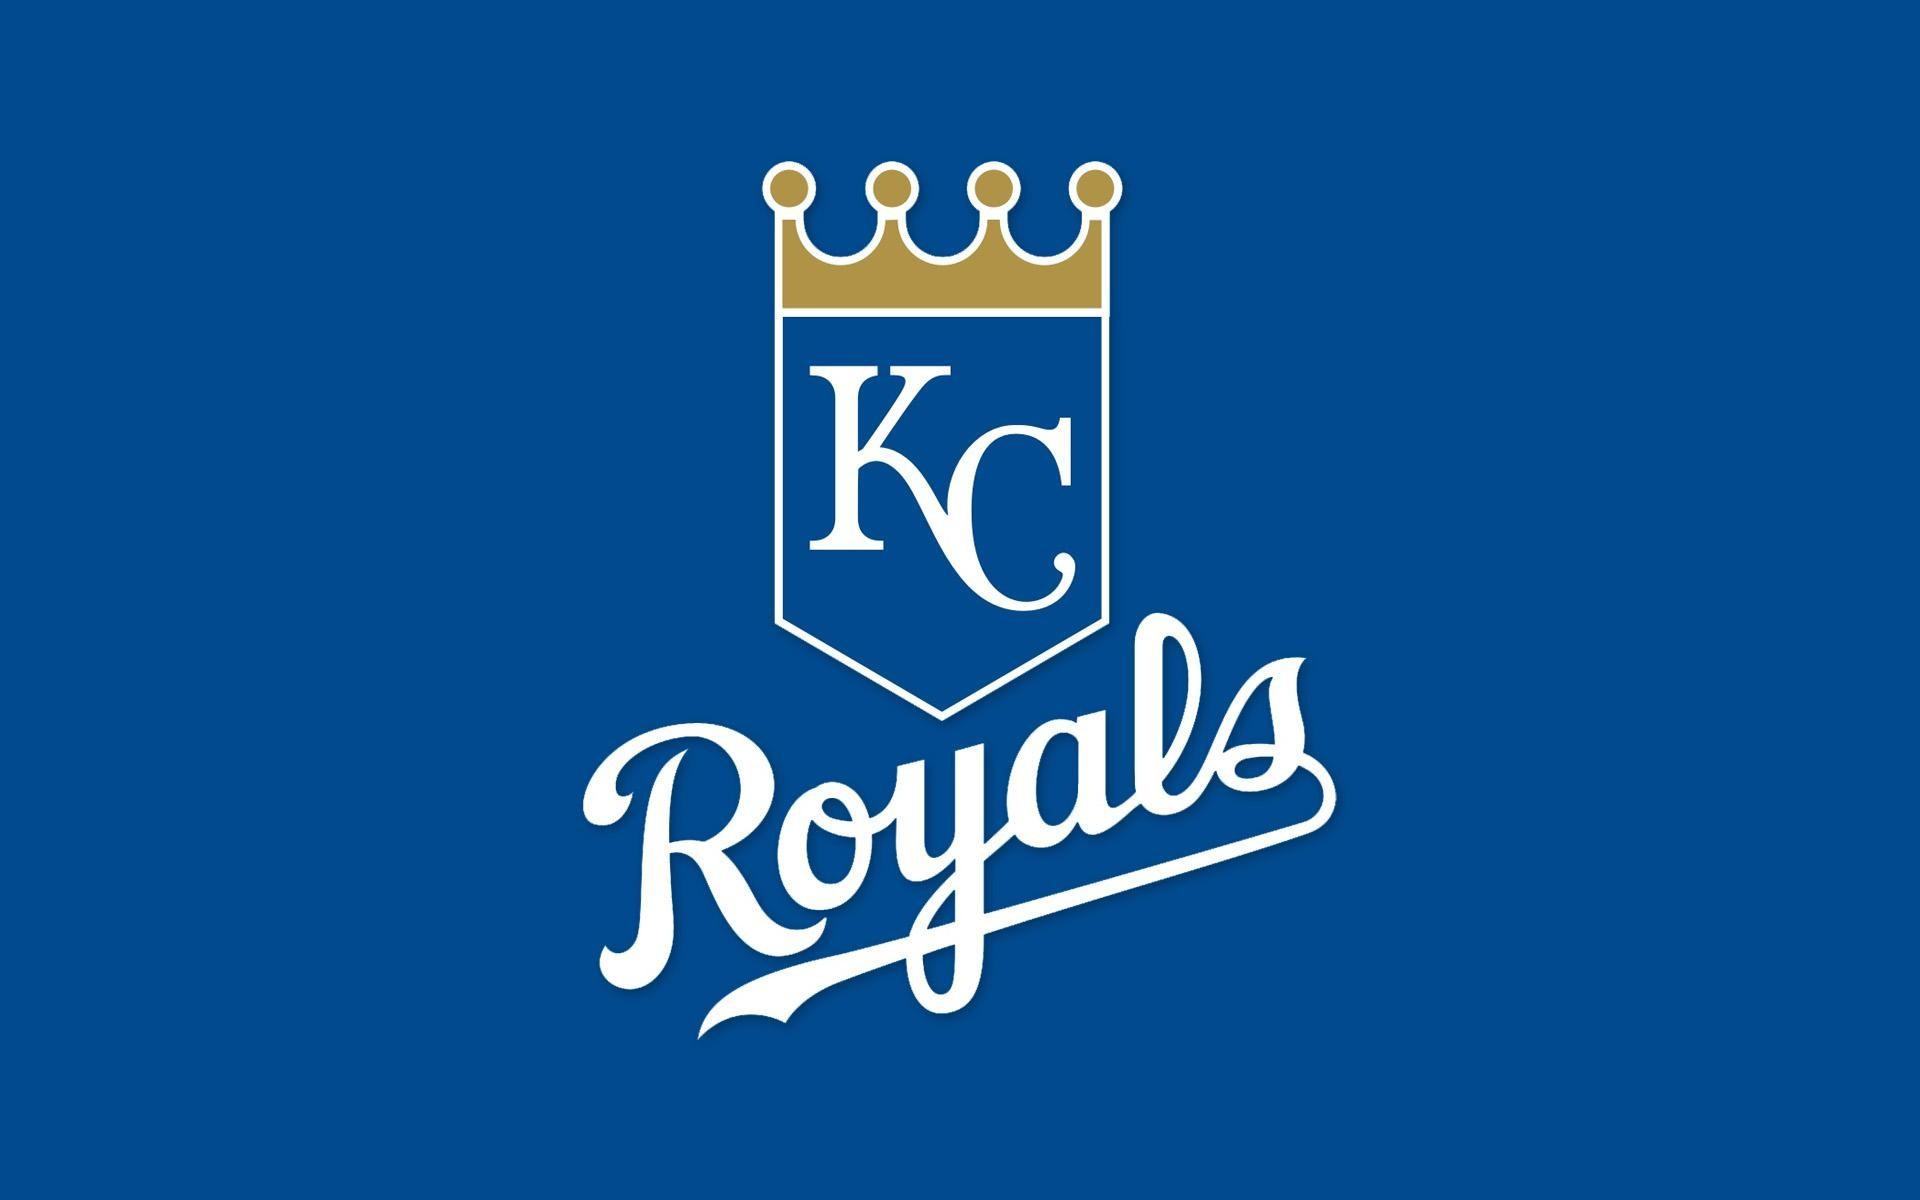 Kansas City Royals Wallpaper